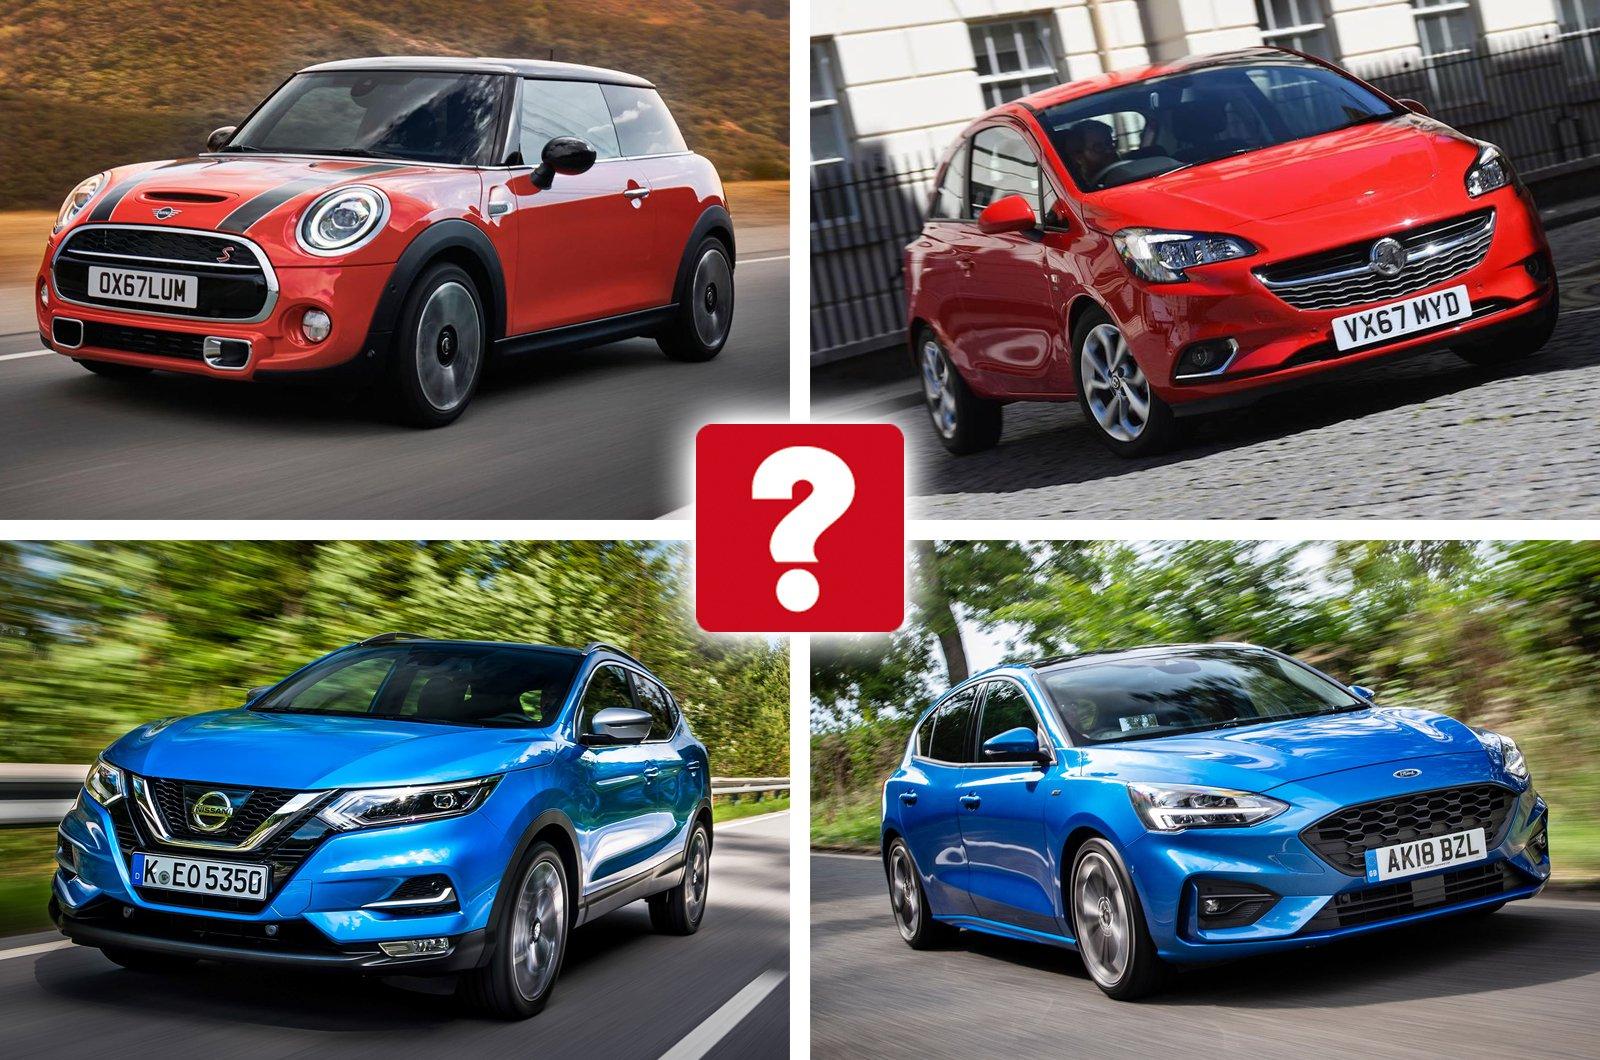 Mini hatchback, Vauxhall Corsa, Nissan Qashqai, Ford Focus